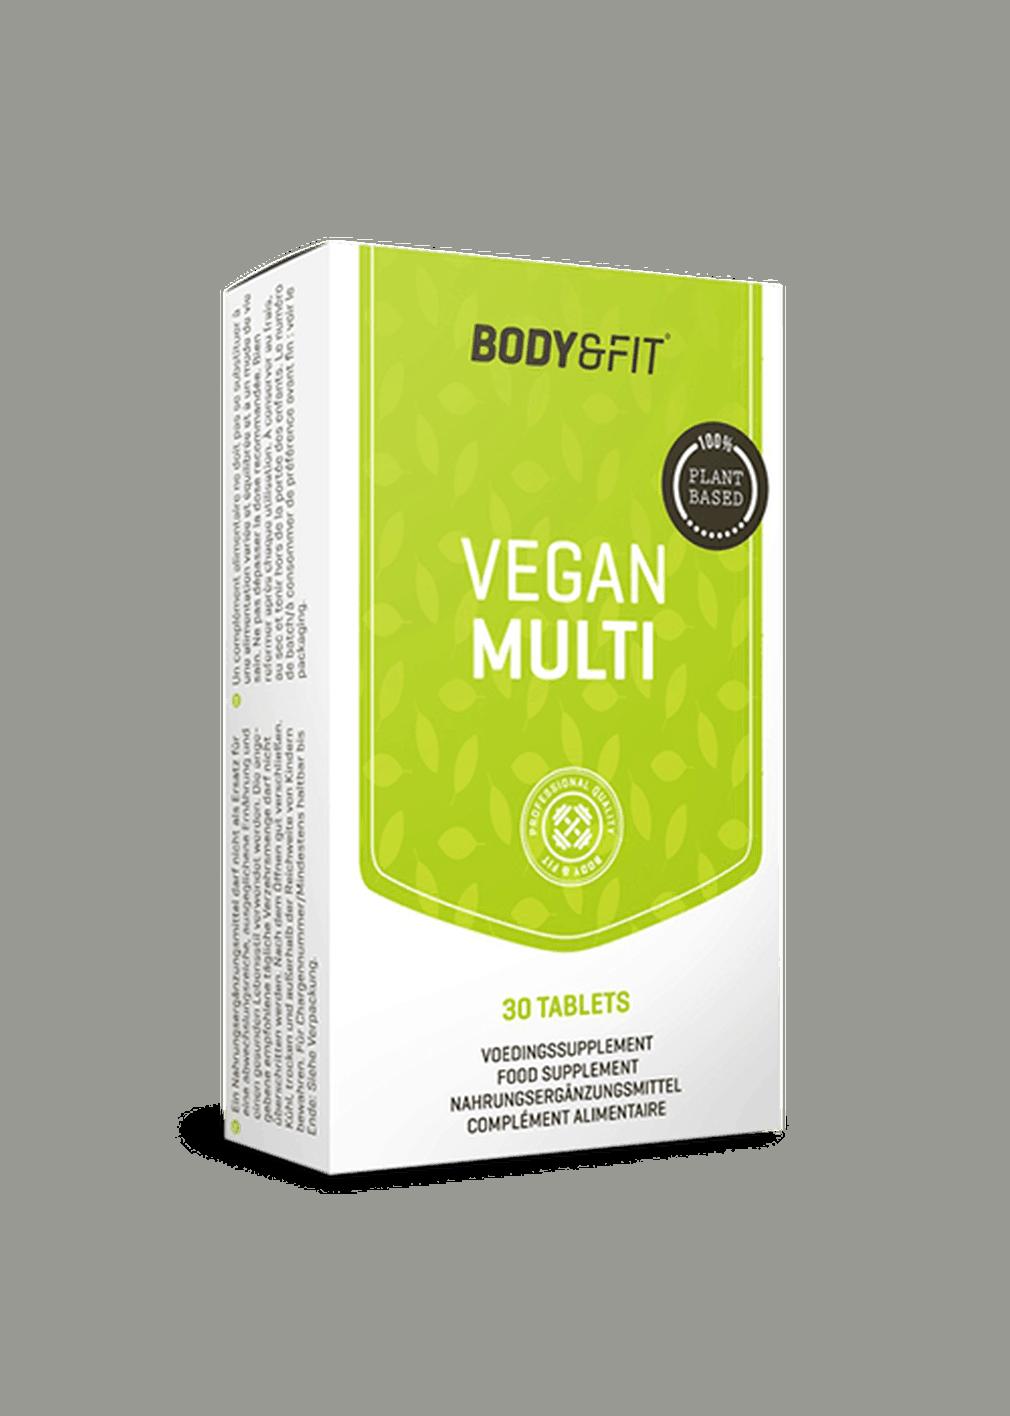 body&fit vegan multi